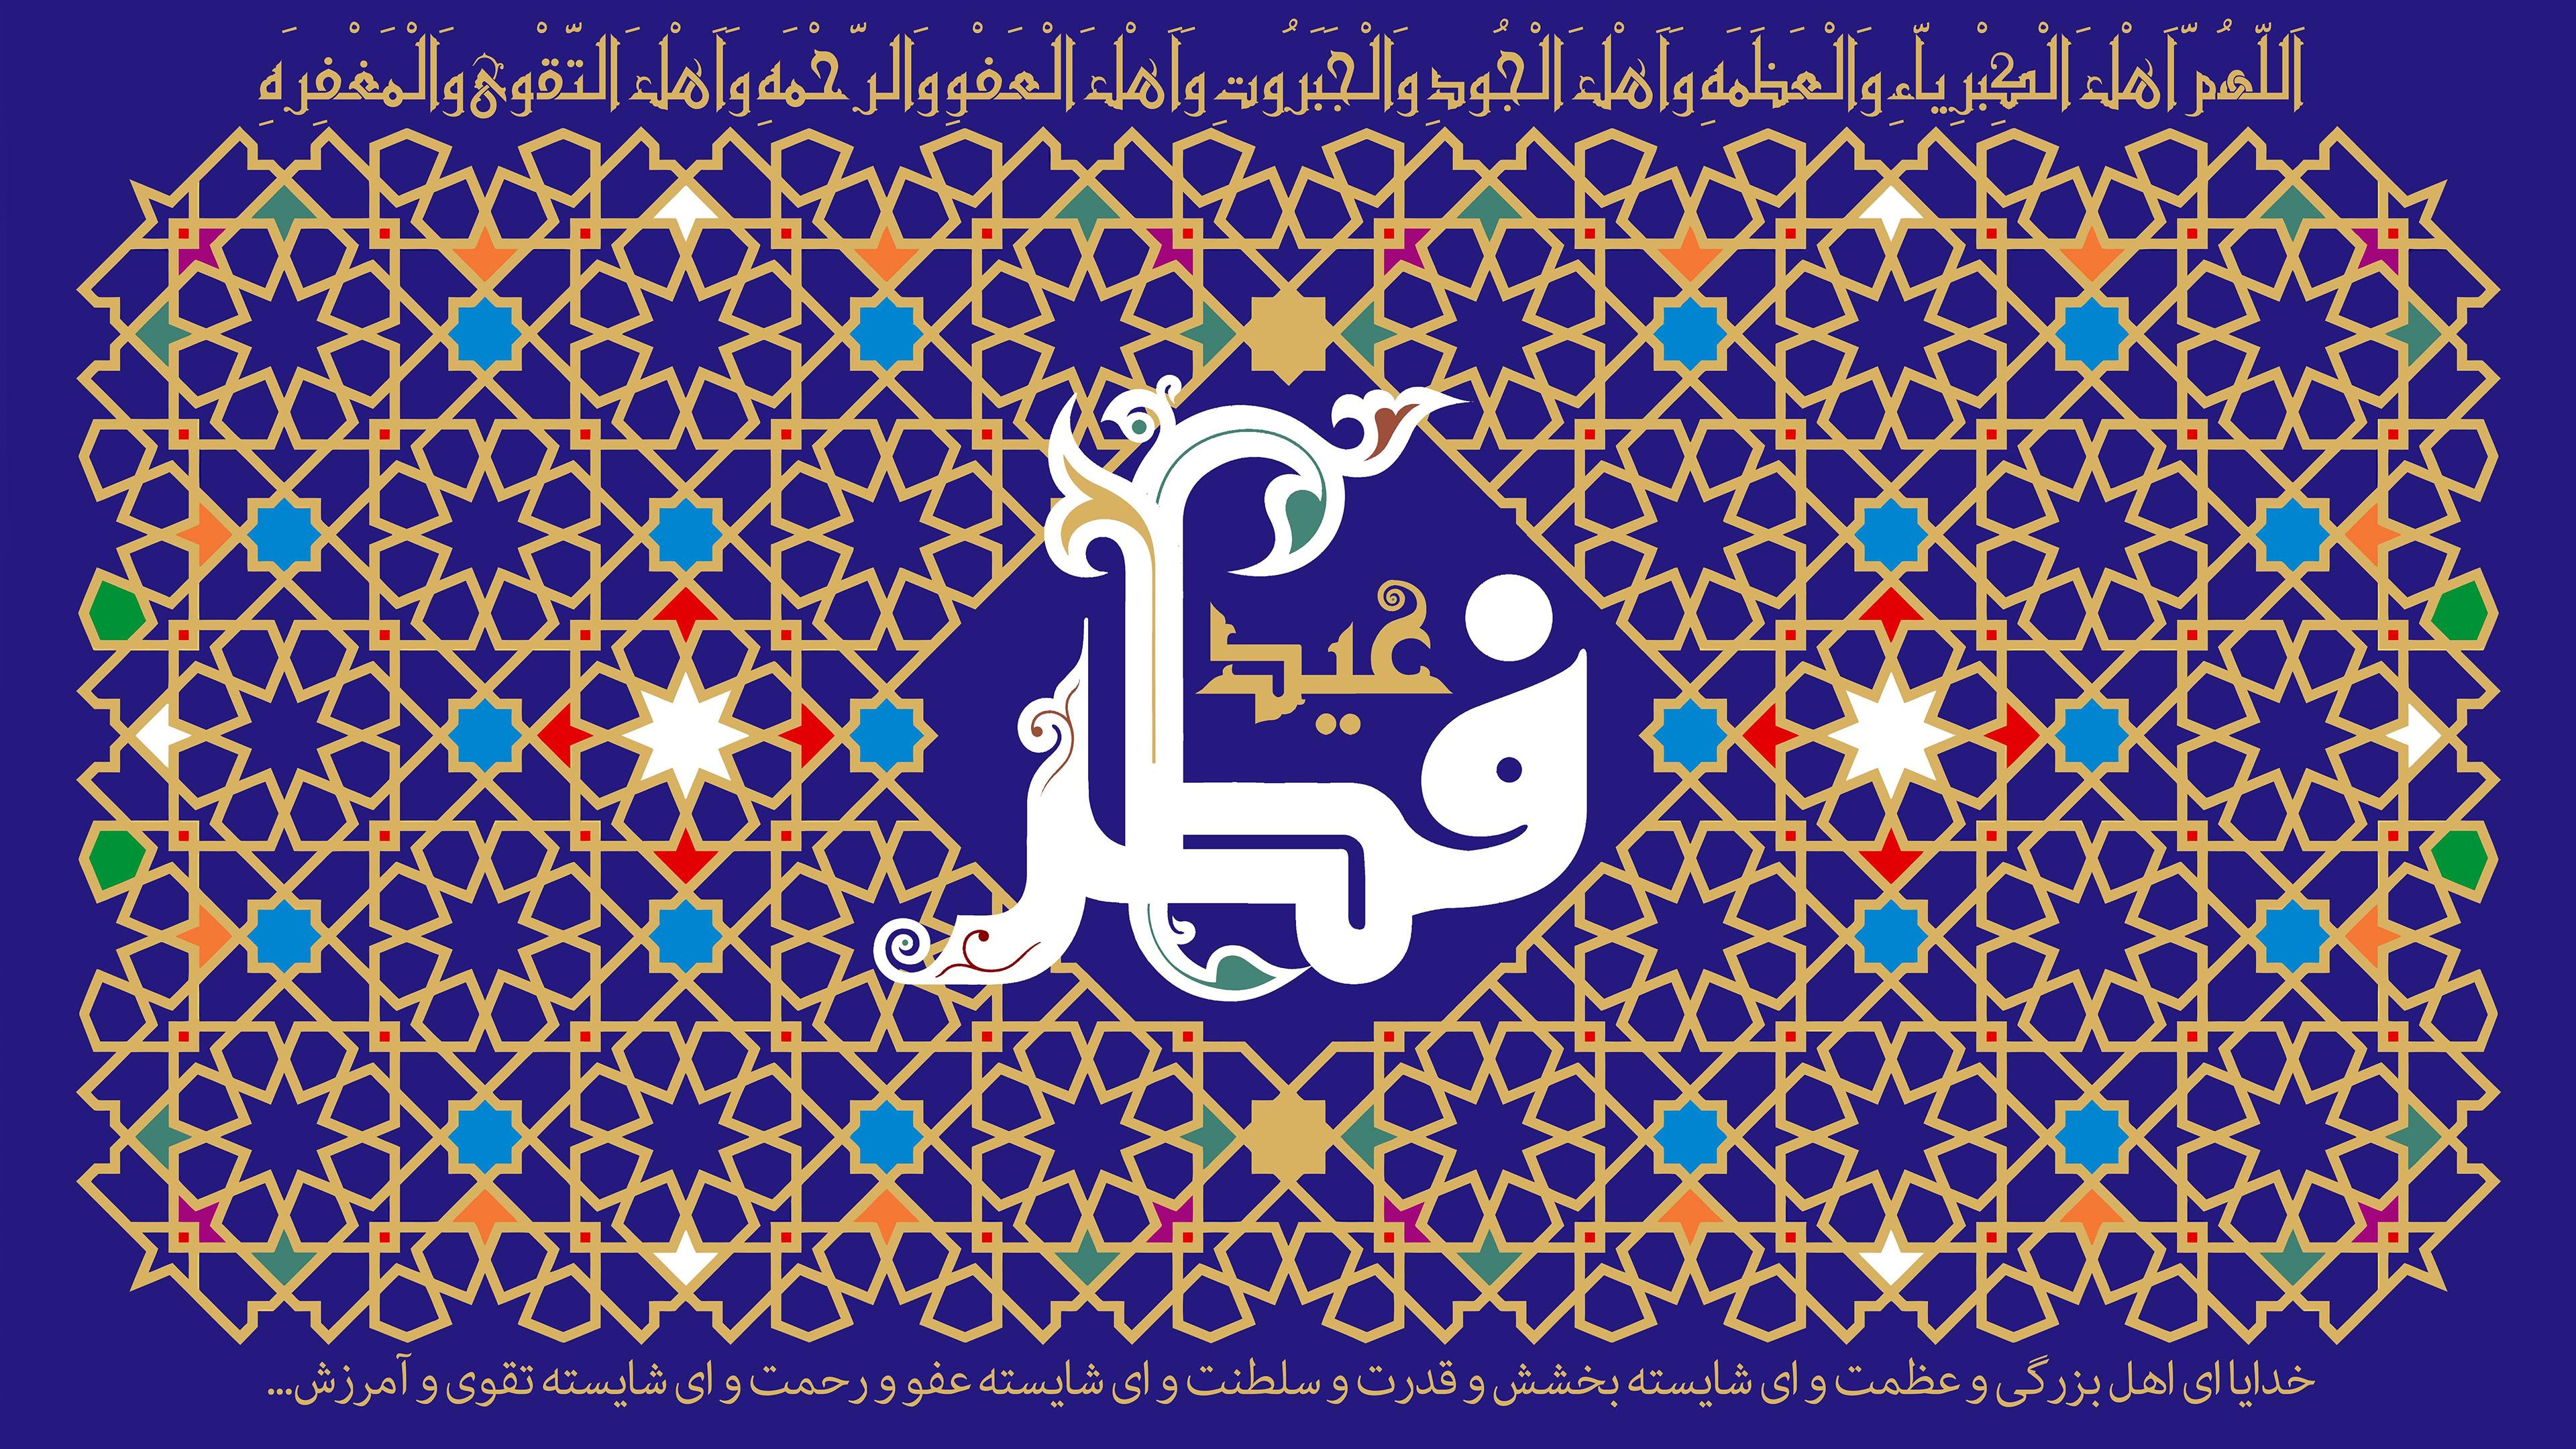 nowruz iranian new year uhd 4k wallpaper